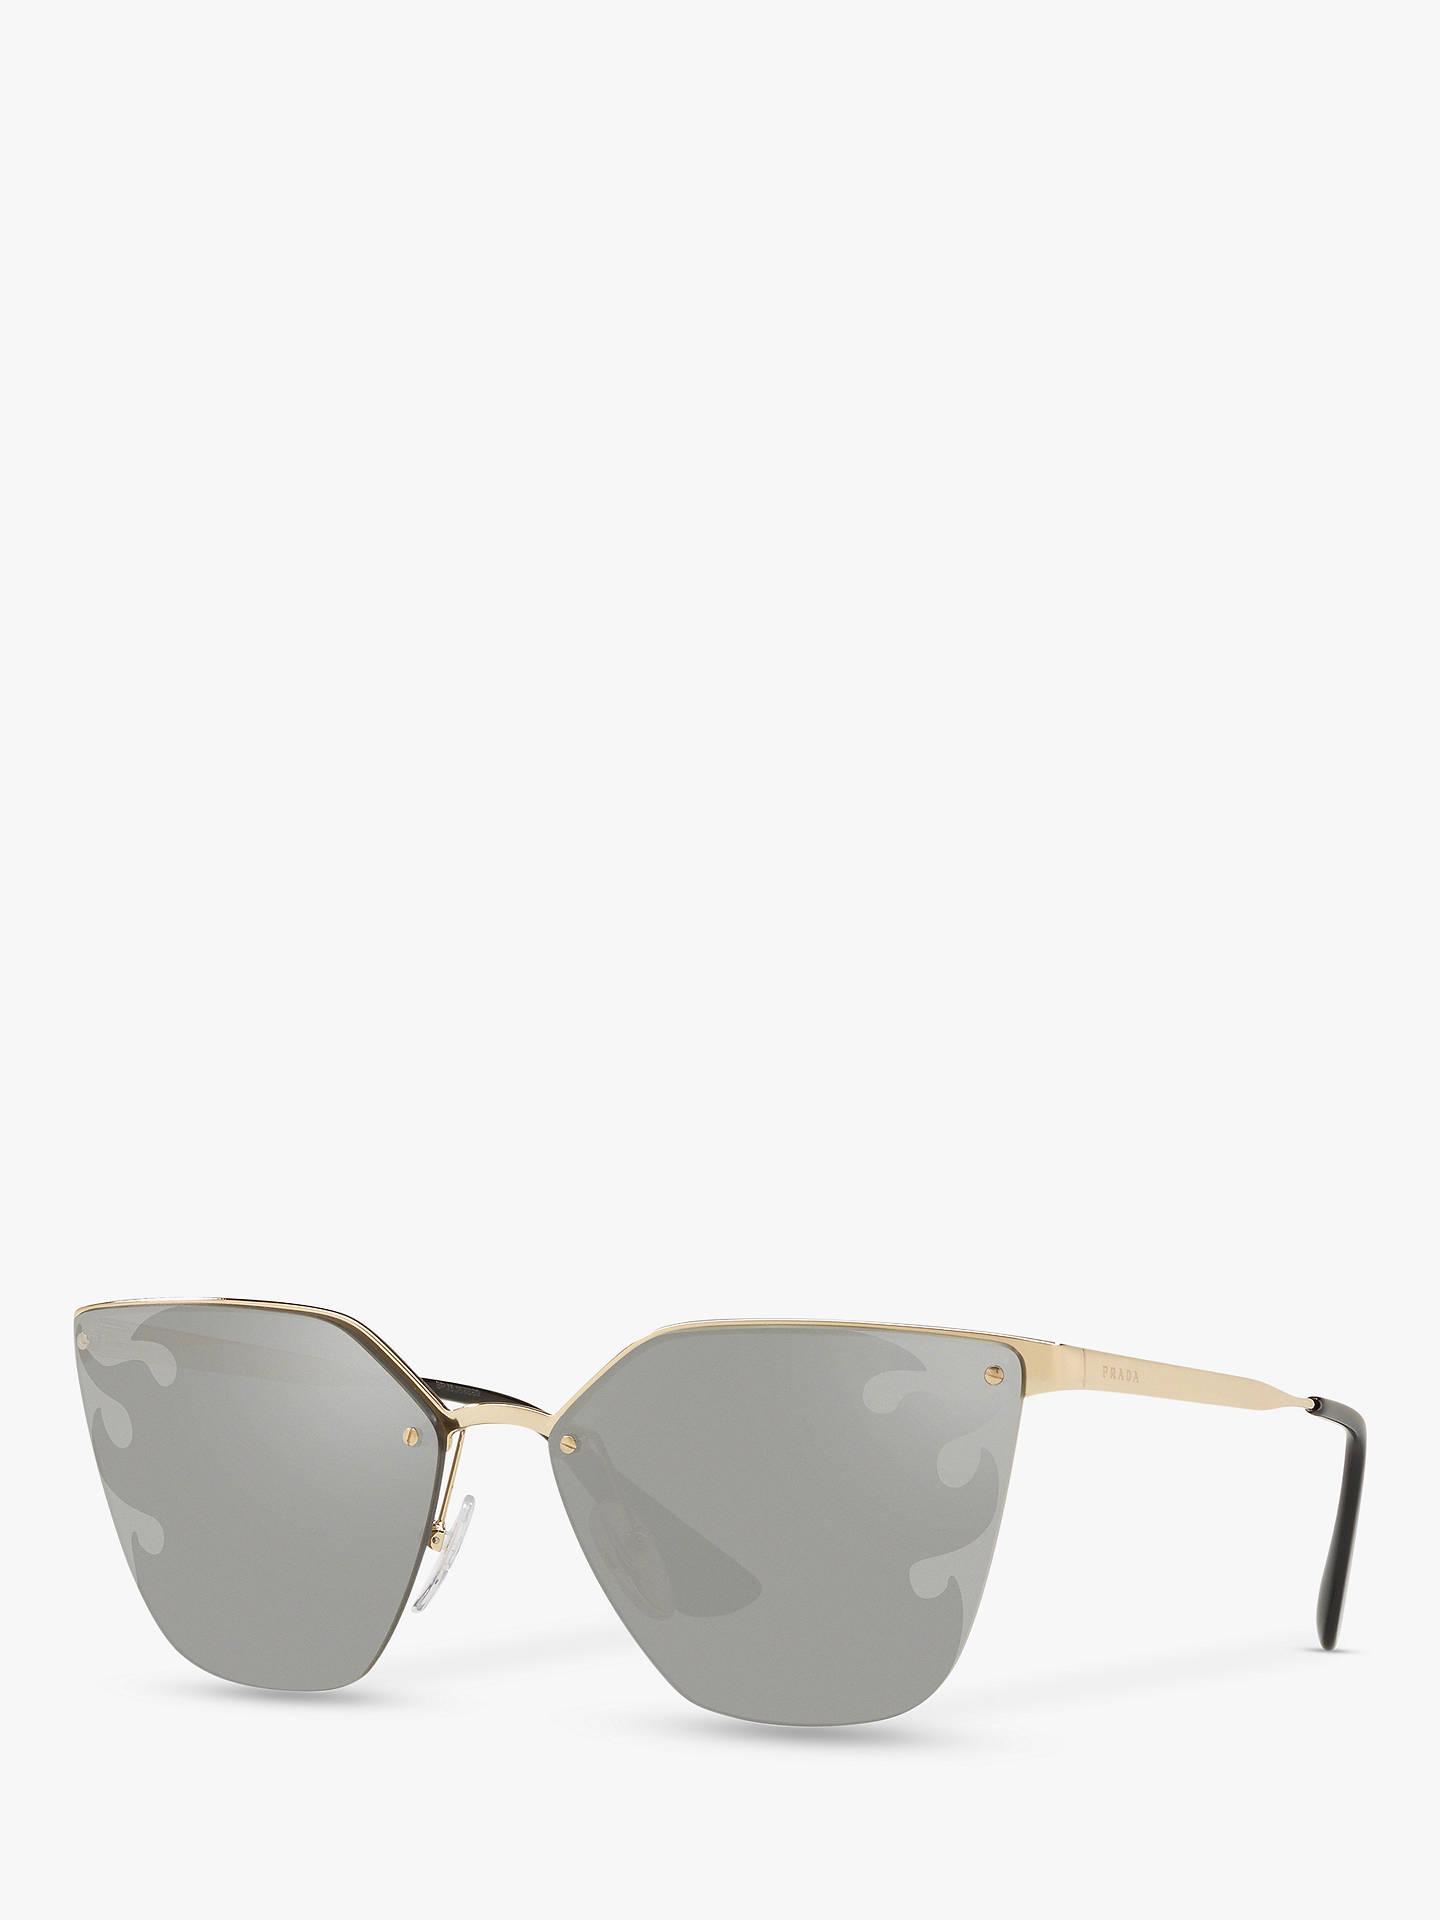 4f2e100ad Buy Prada PR 68TS Women's Cat's Eye Sunglasses, Gold/Mirror Silver Online  at johnlewis ...